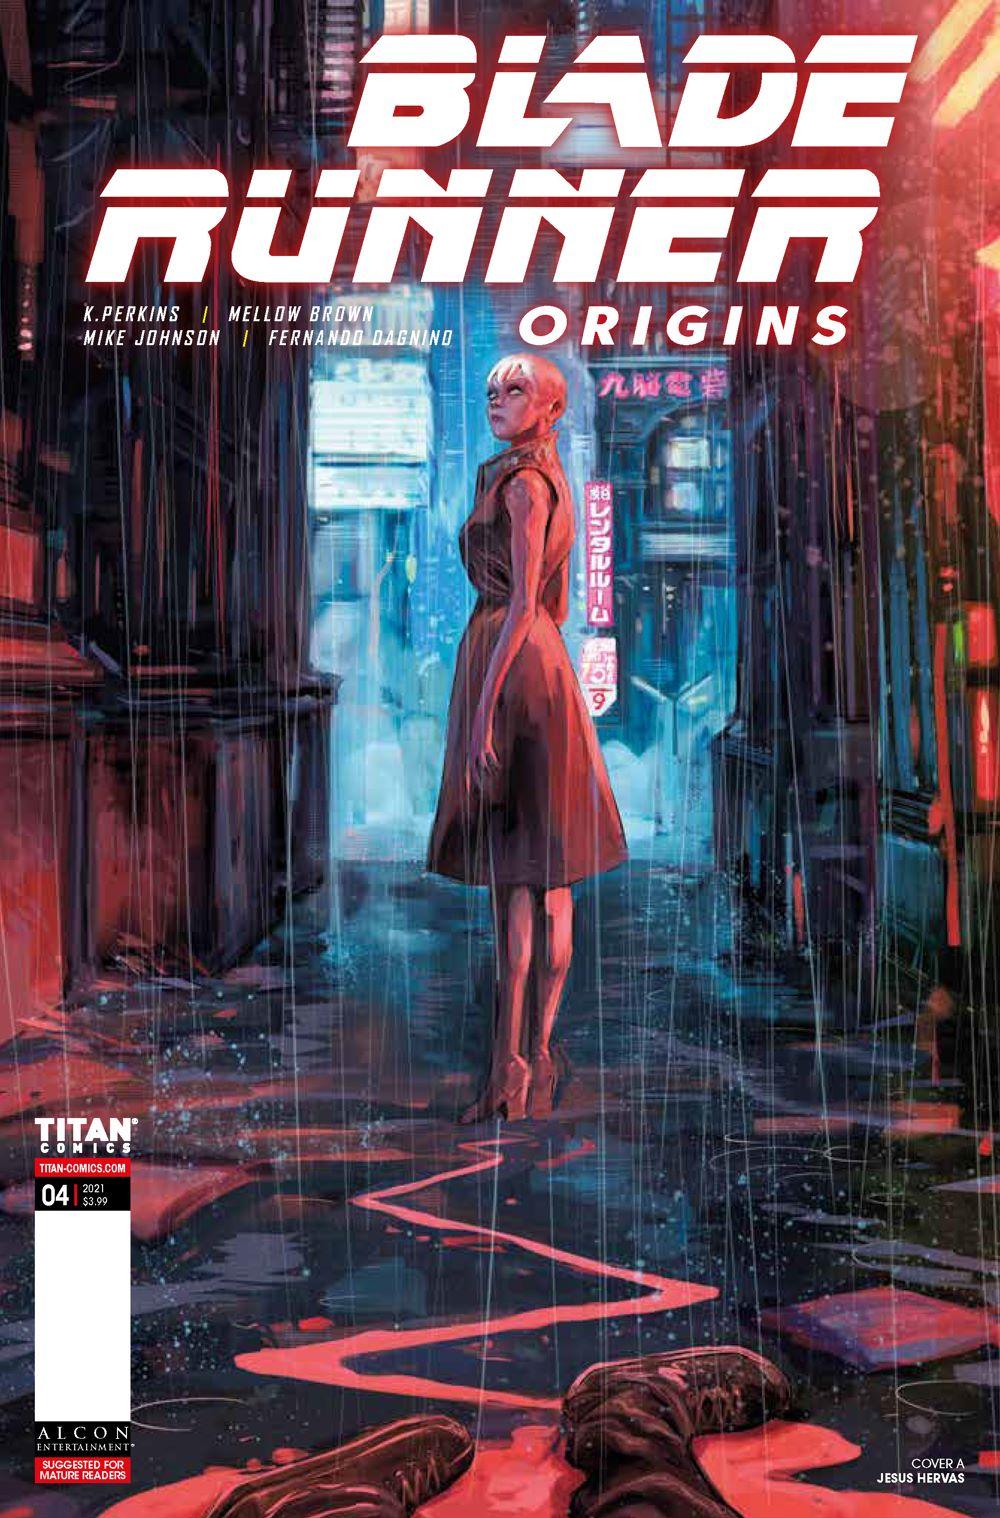 Blade_Runner_Origins_4_COVERS-DML2_Page_1 ComicList Previews: BLADE RUNNER ORIGINS #4